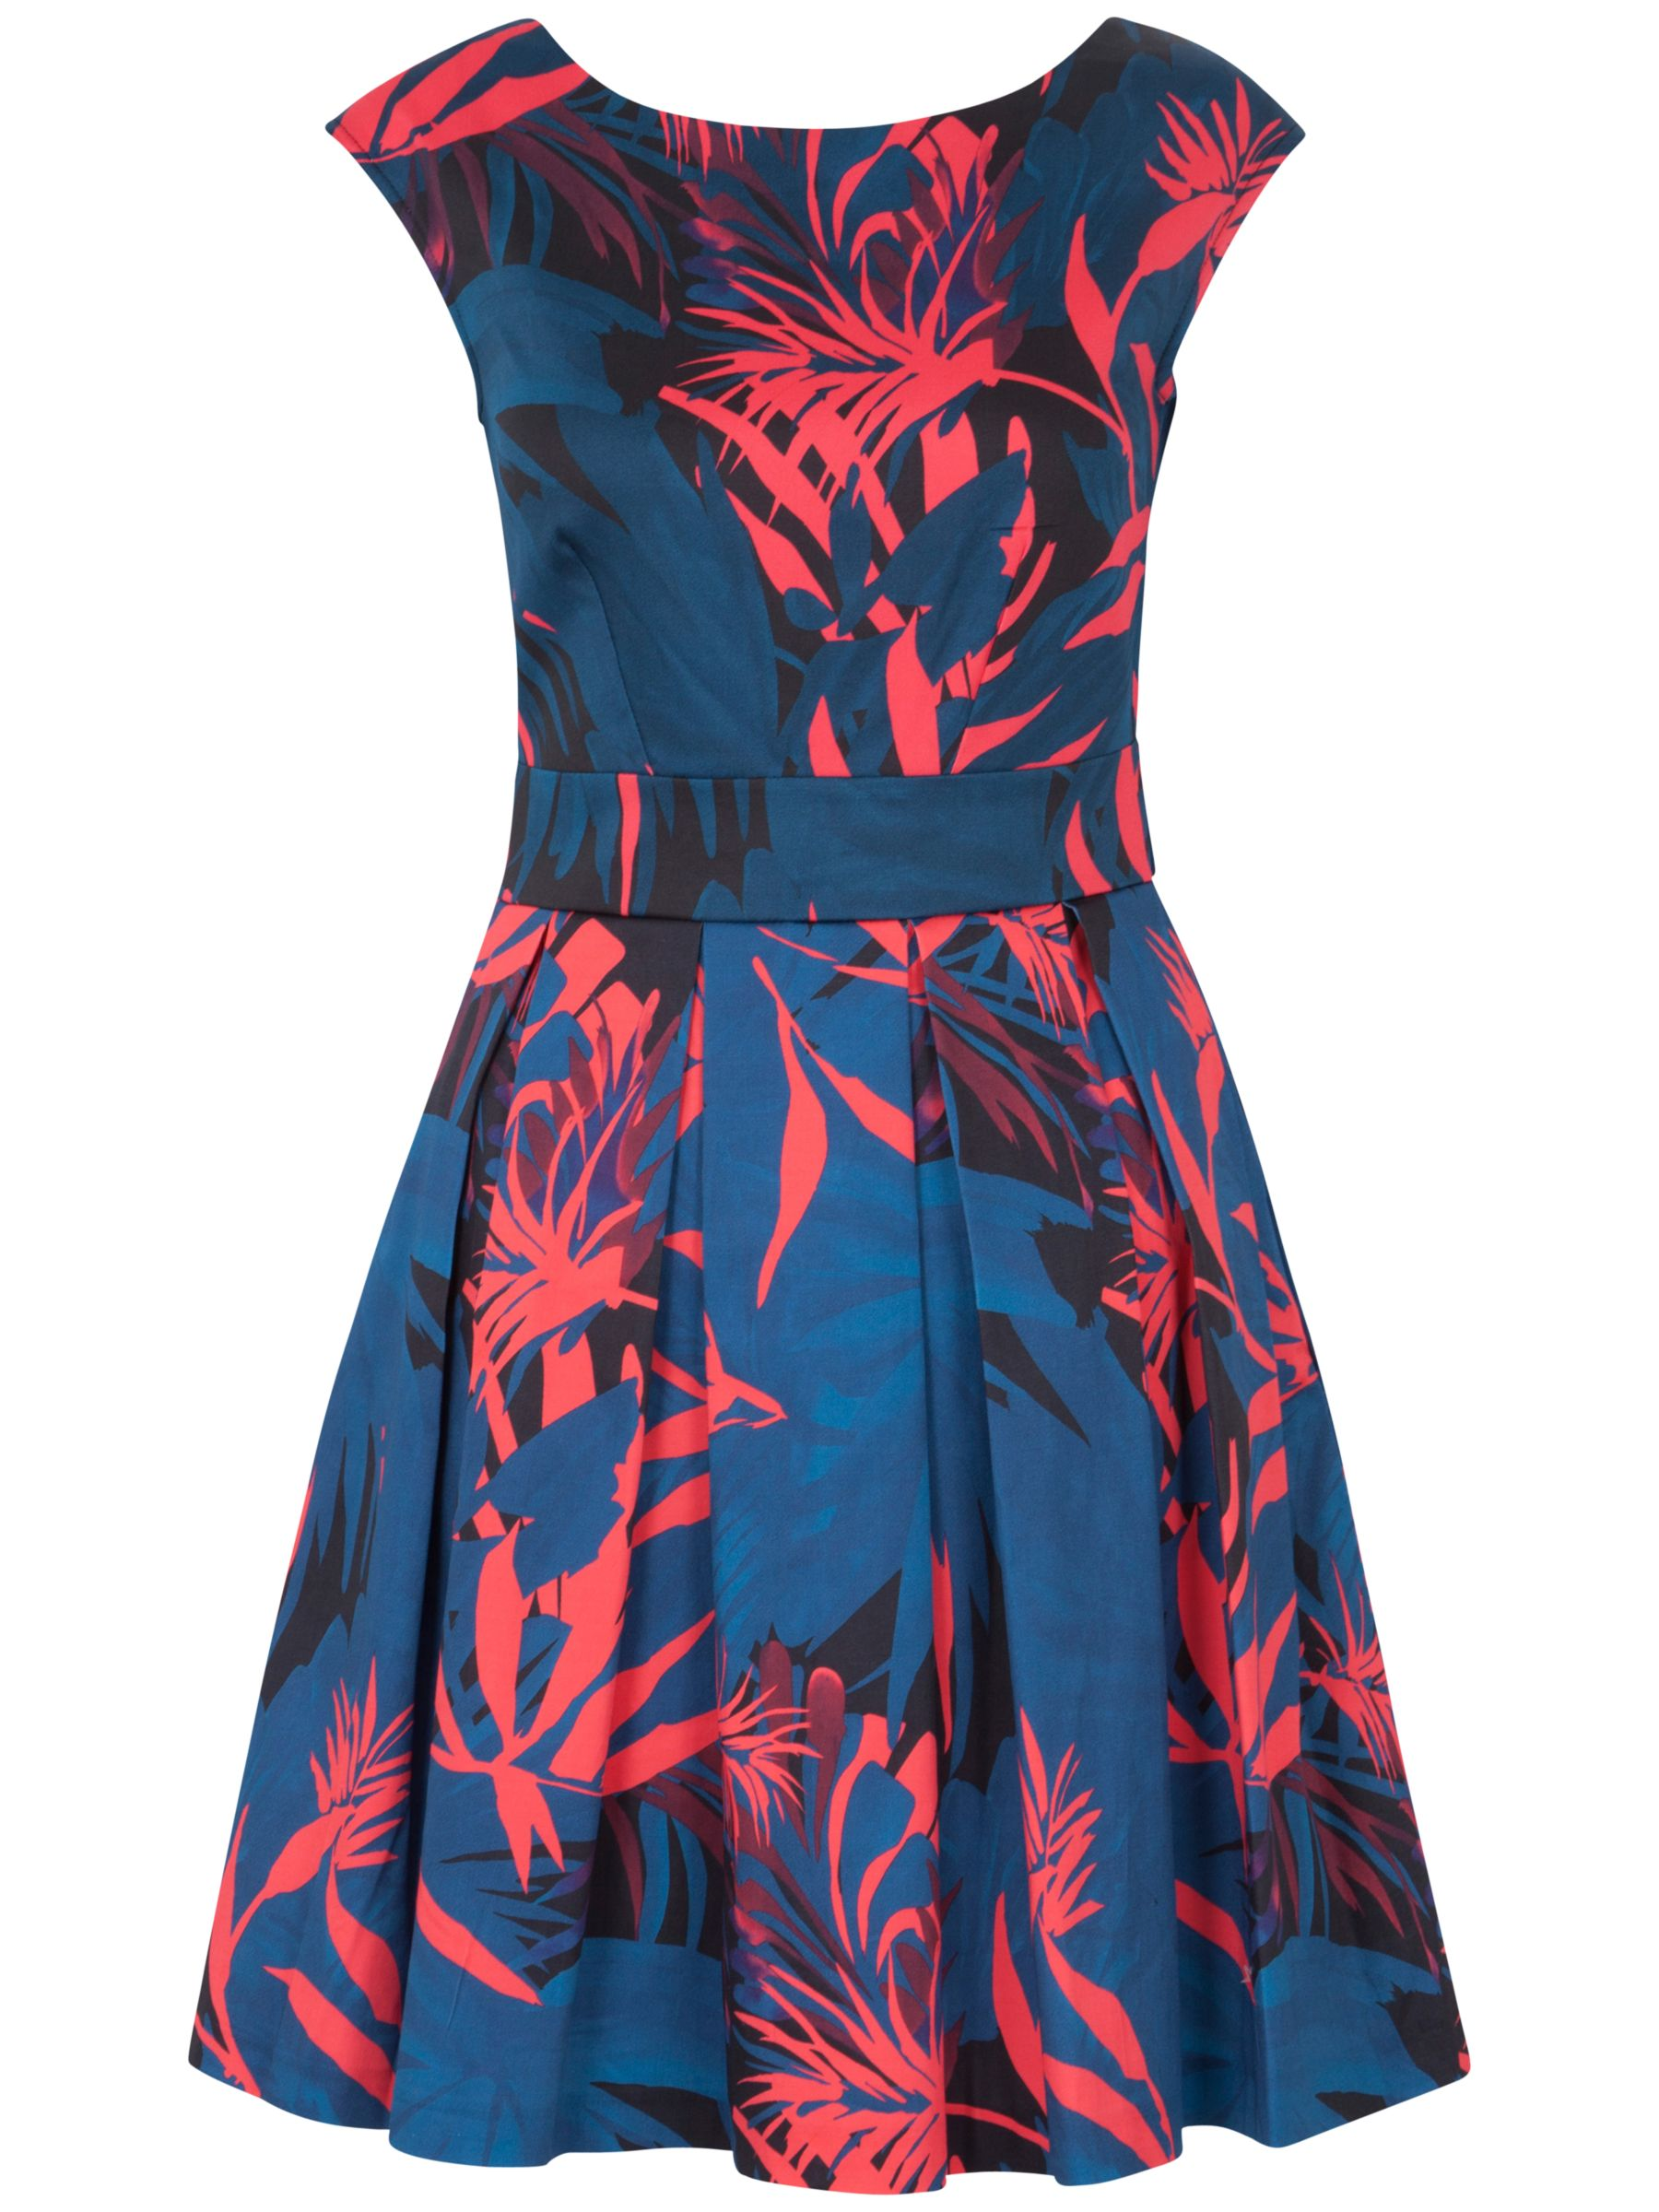 closet palm print tie back dress multi, closet, palm, print, tie, back, dress, multi, 8|10|12|14|16, women, womens dresses, gifts, wedding, wedding clothing, female guests, 1697840